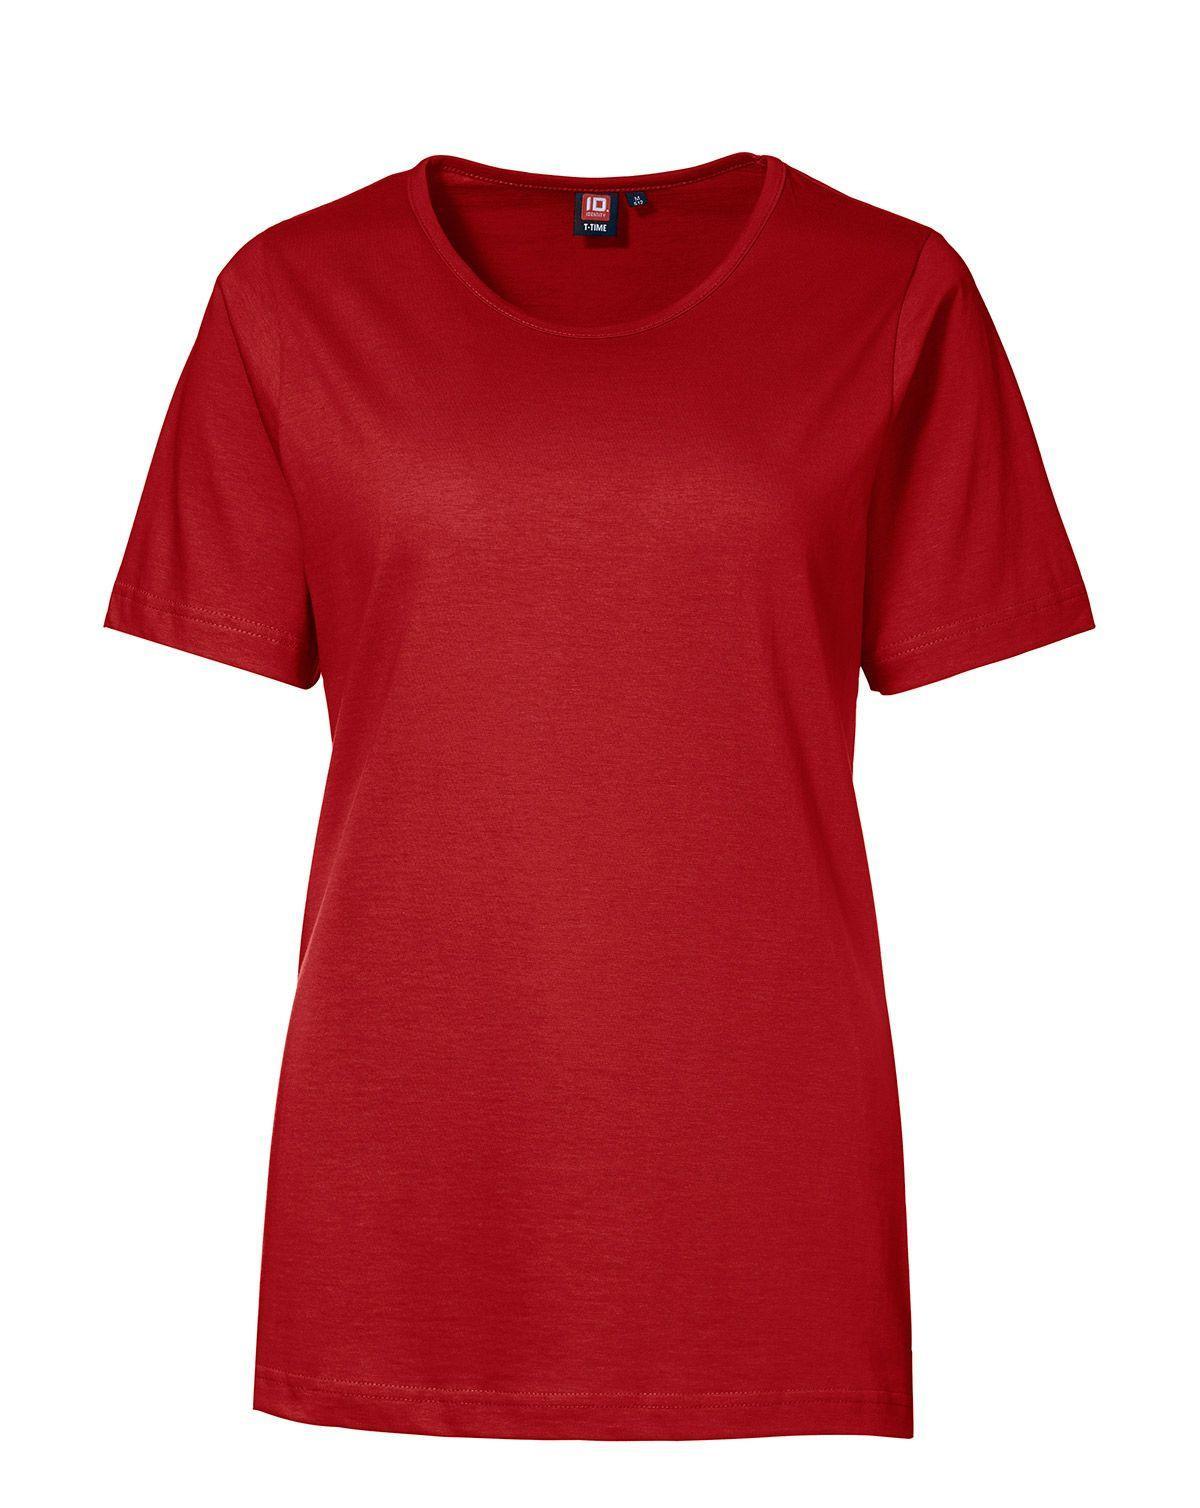 ID T-TIME T-shirt til Kvinder (Rød, L)